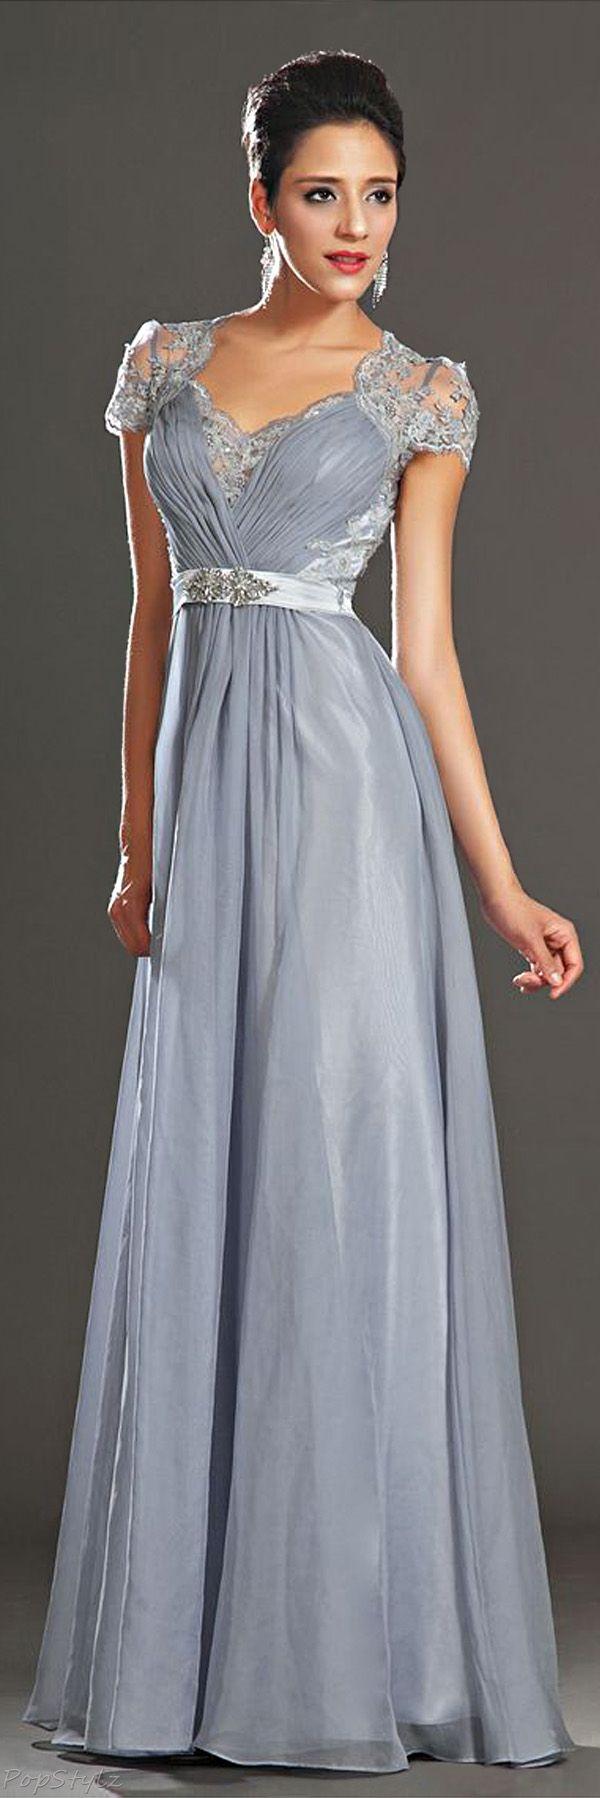 Pin by gazza warne on glamorous pinterest prom maxi dresses